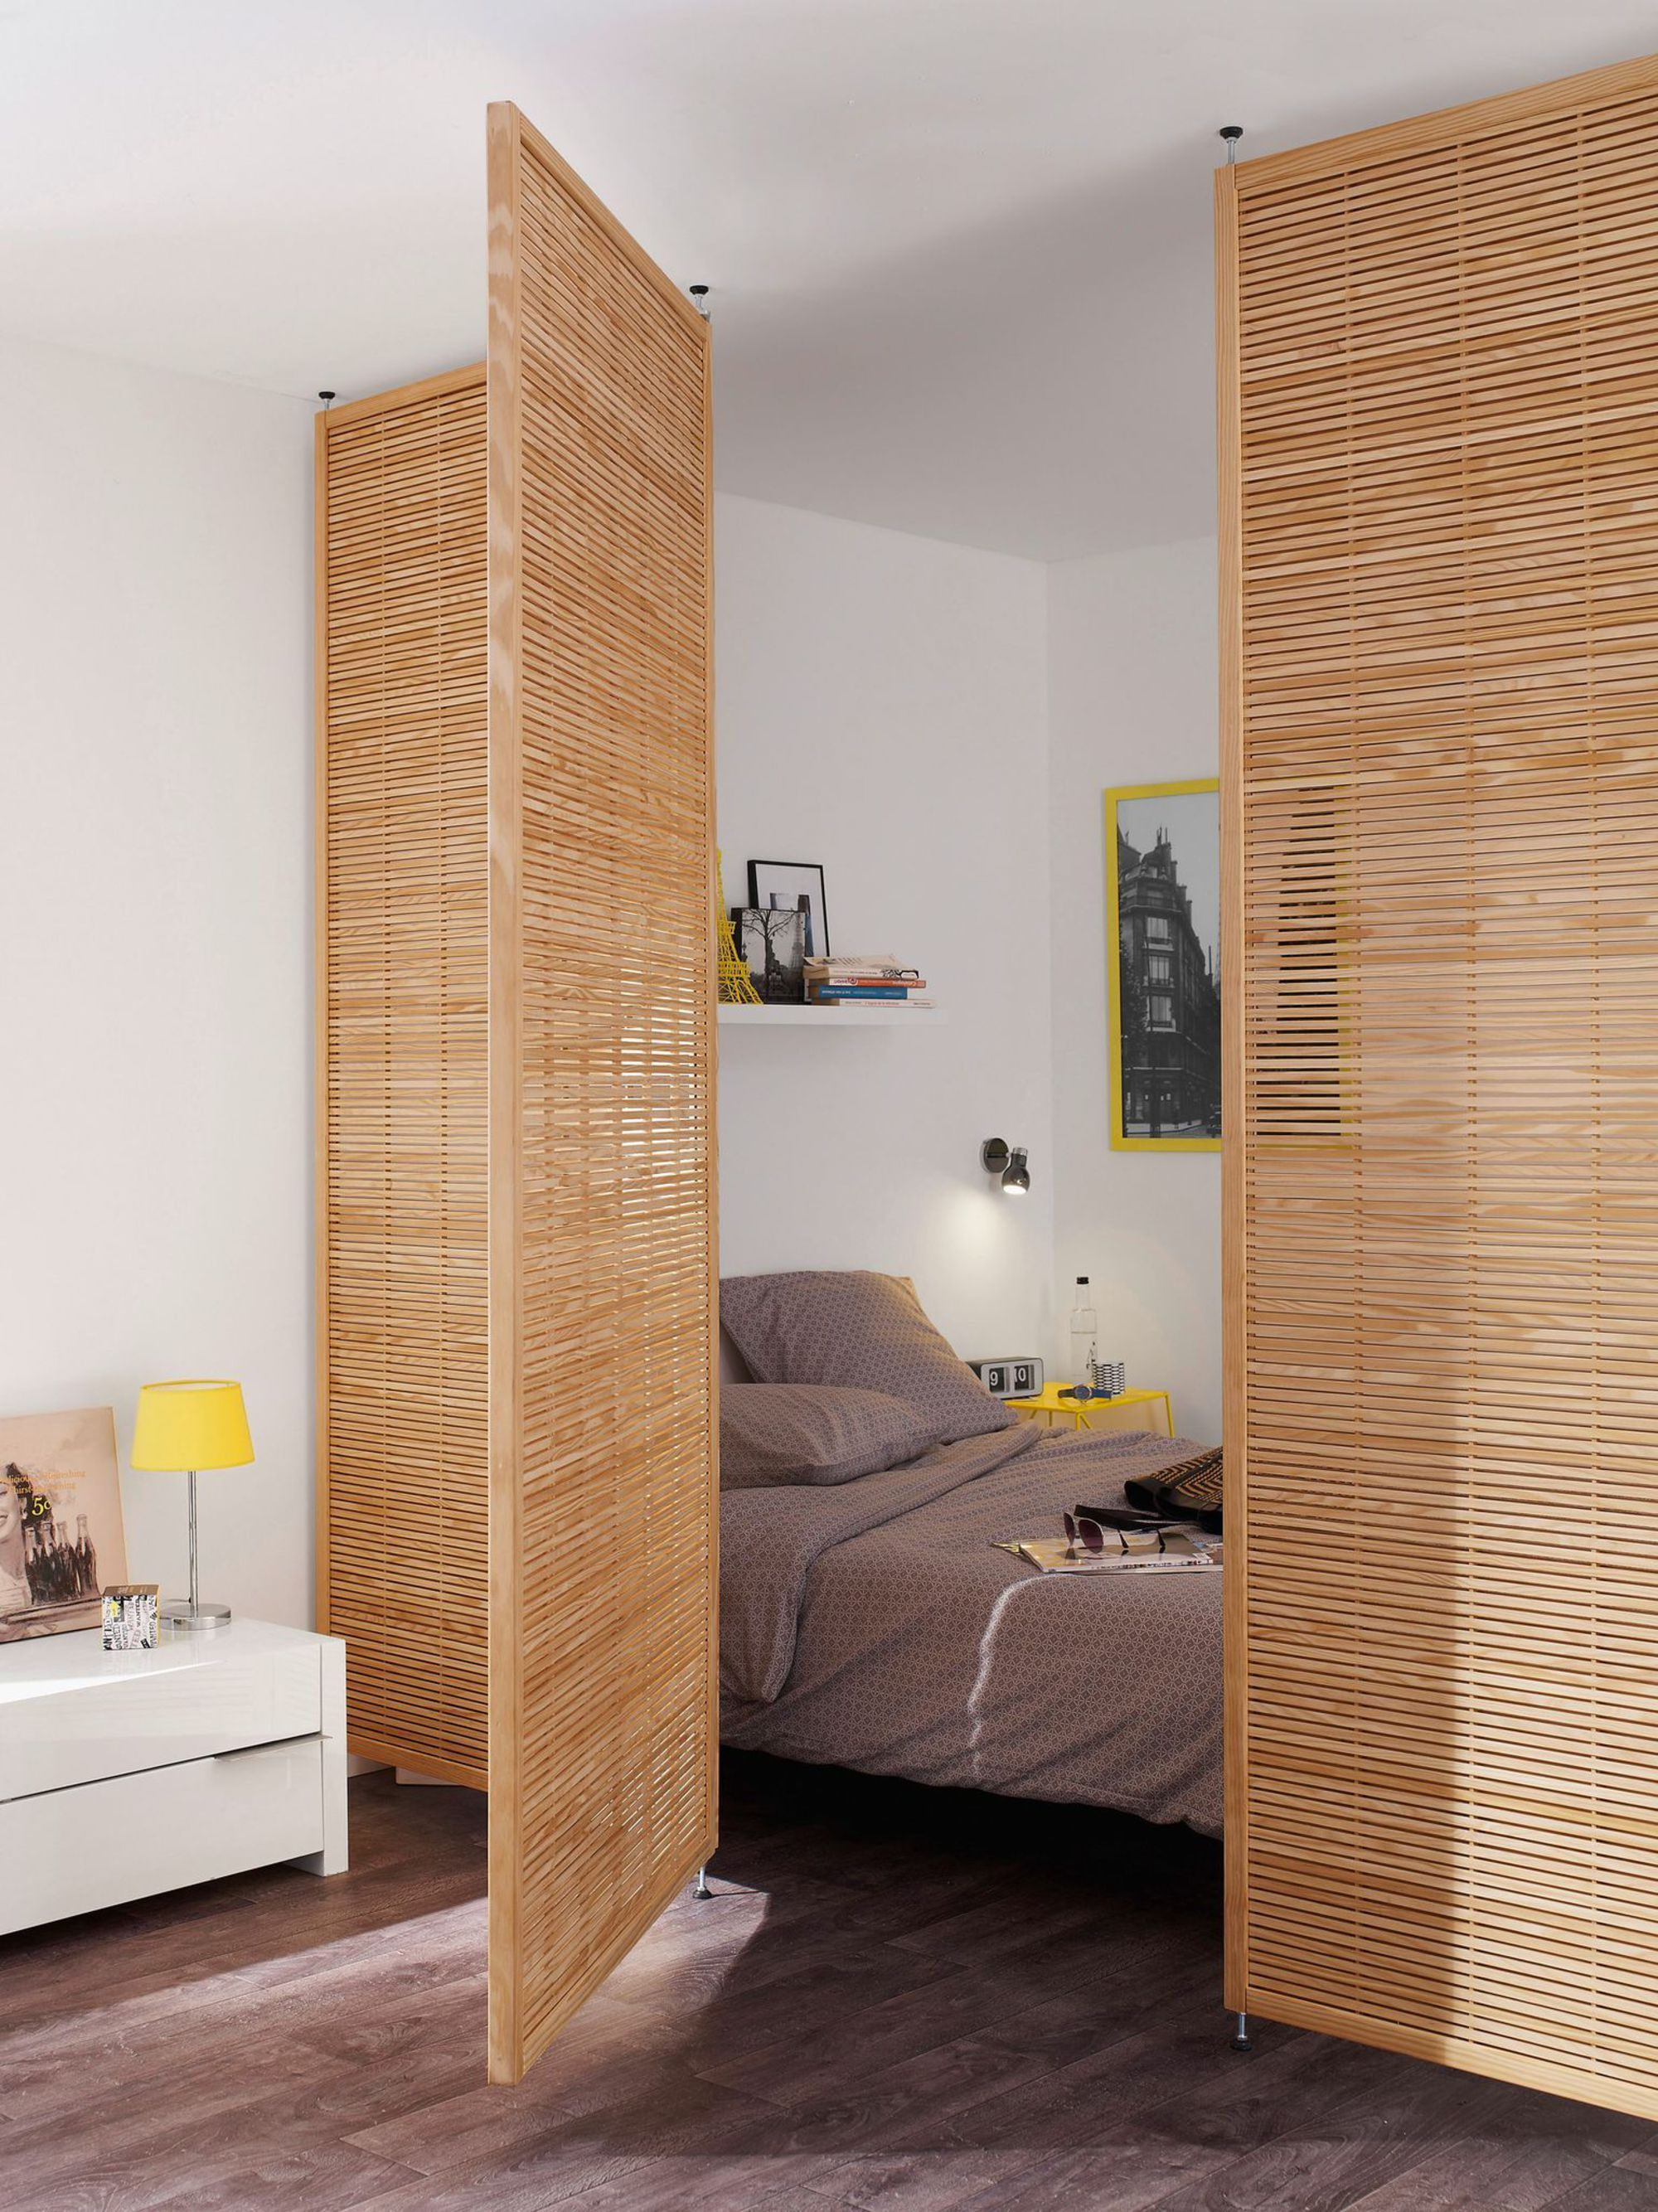 Bamboo room divider studio apartments room divider wall built ins